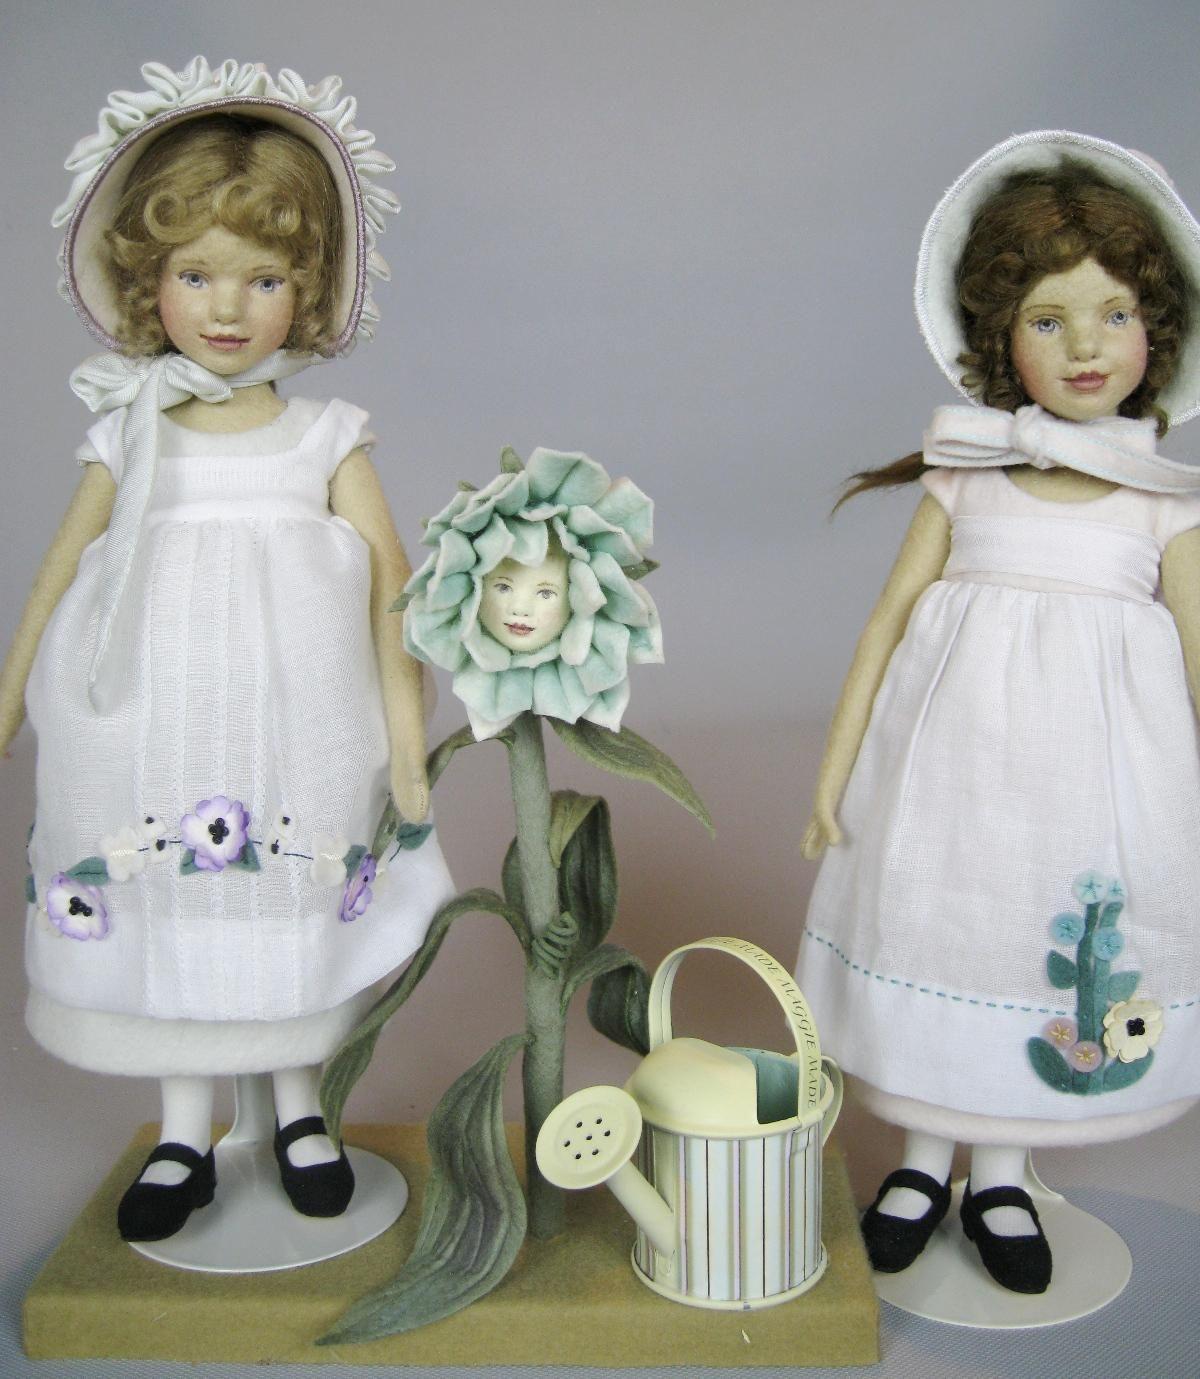 Two Maggie Iacono 'Meadow' Dolls UFDC 2009 Atlanta